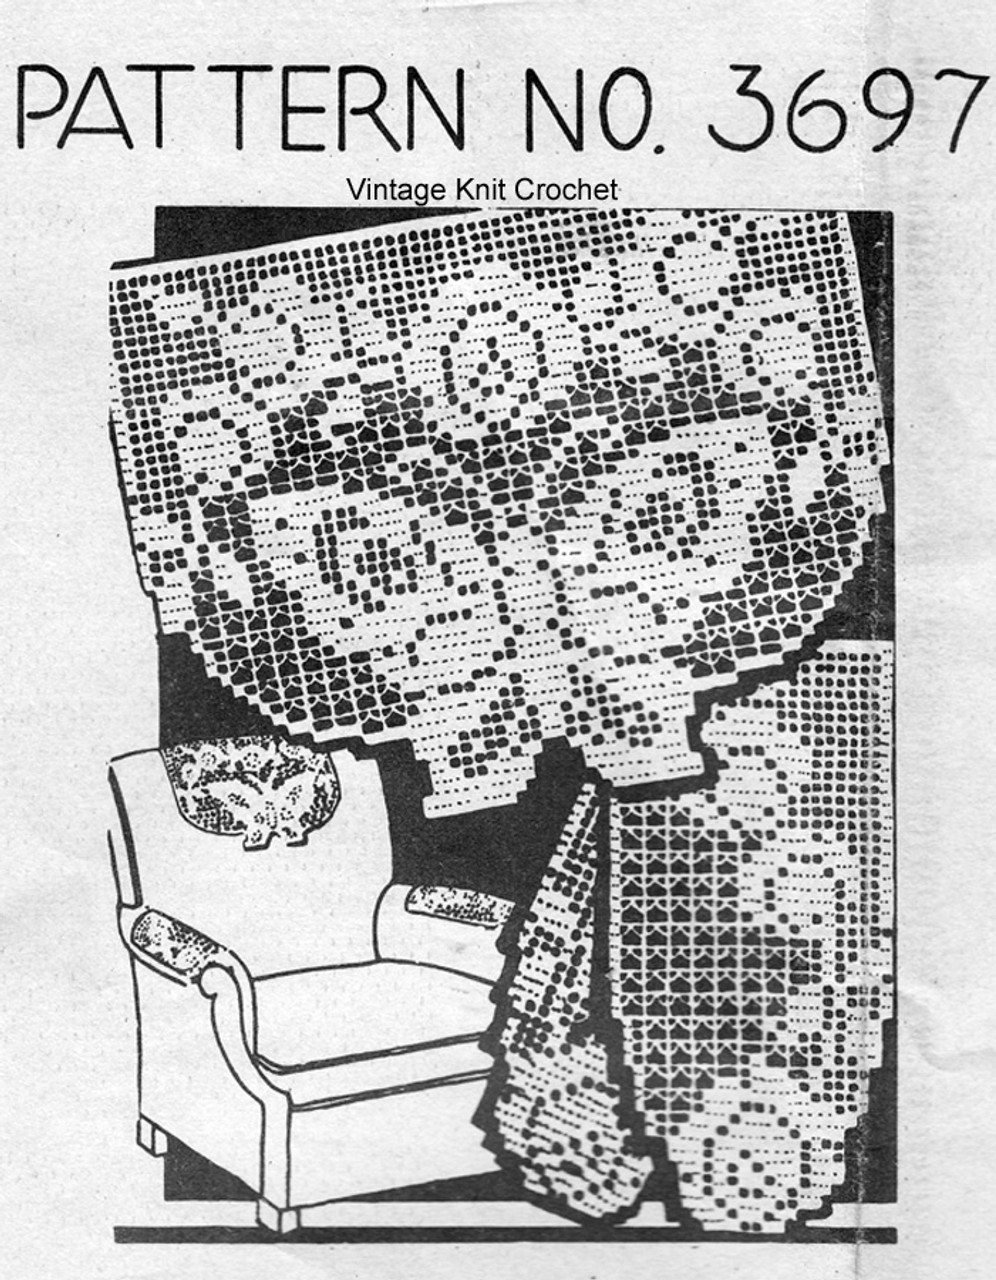 Filet Crochet Butterfly Pattern, Chair Set, Mail Order 3697